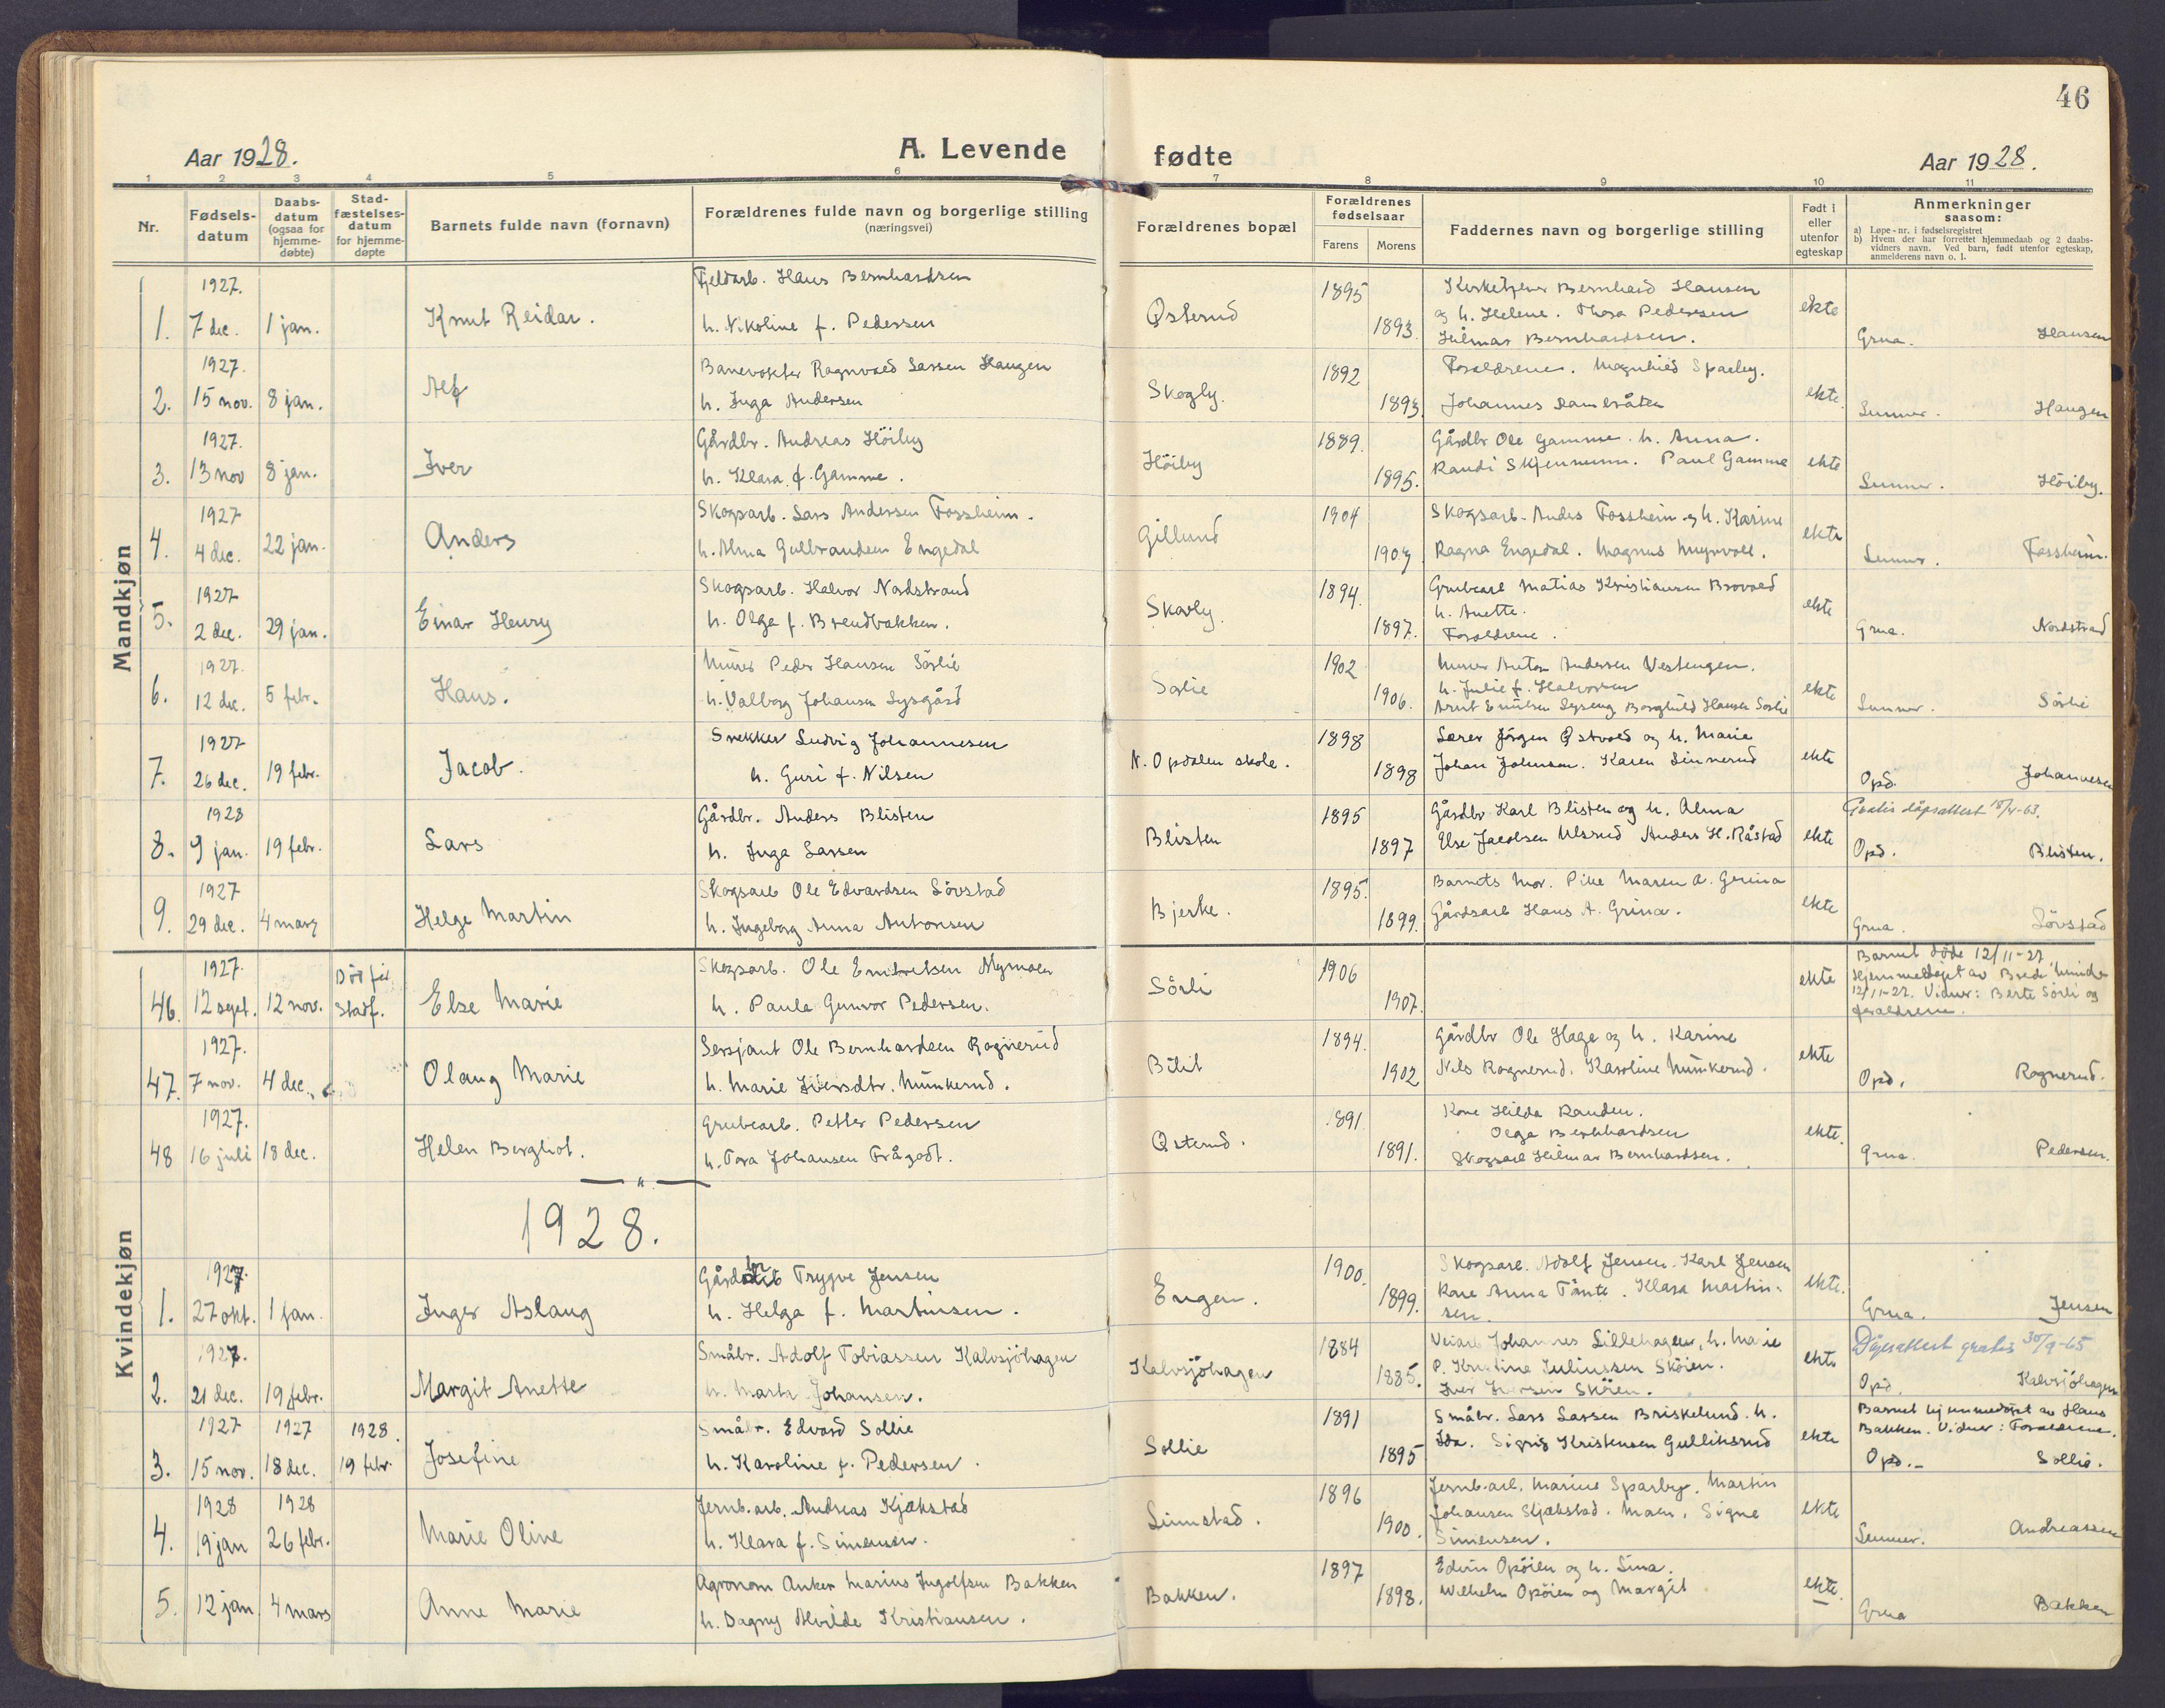 SAH, Lunner prestekontor, H/Ha/Haa/L0002: Ministerialbok nr. 2, 1922-1931, s. 46